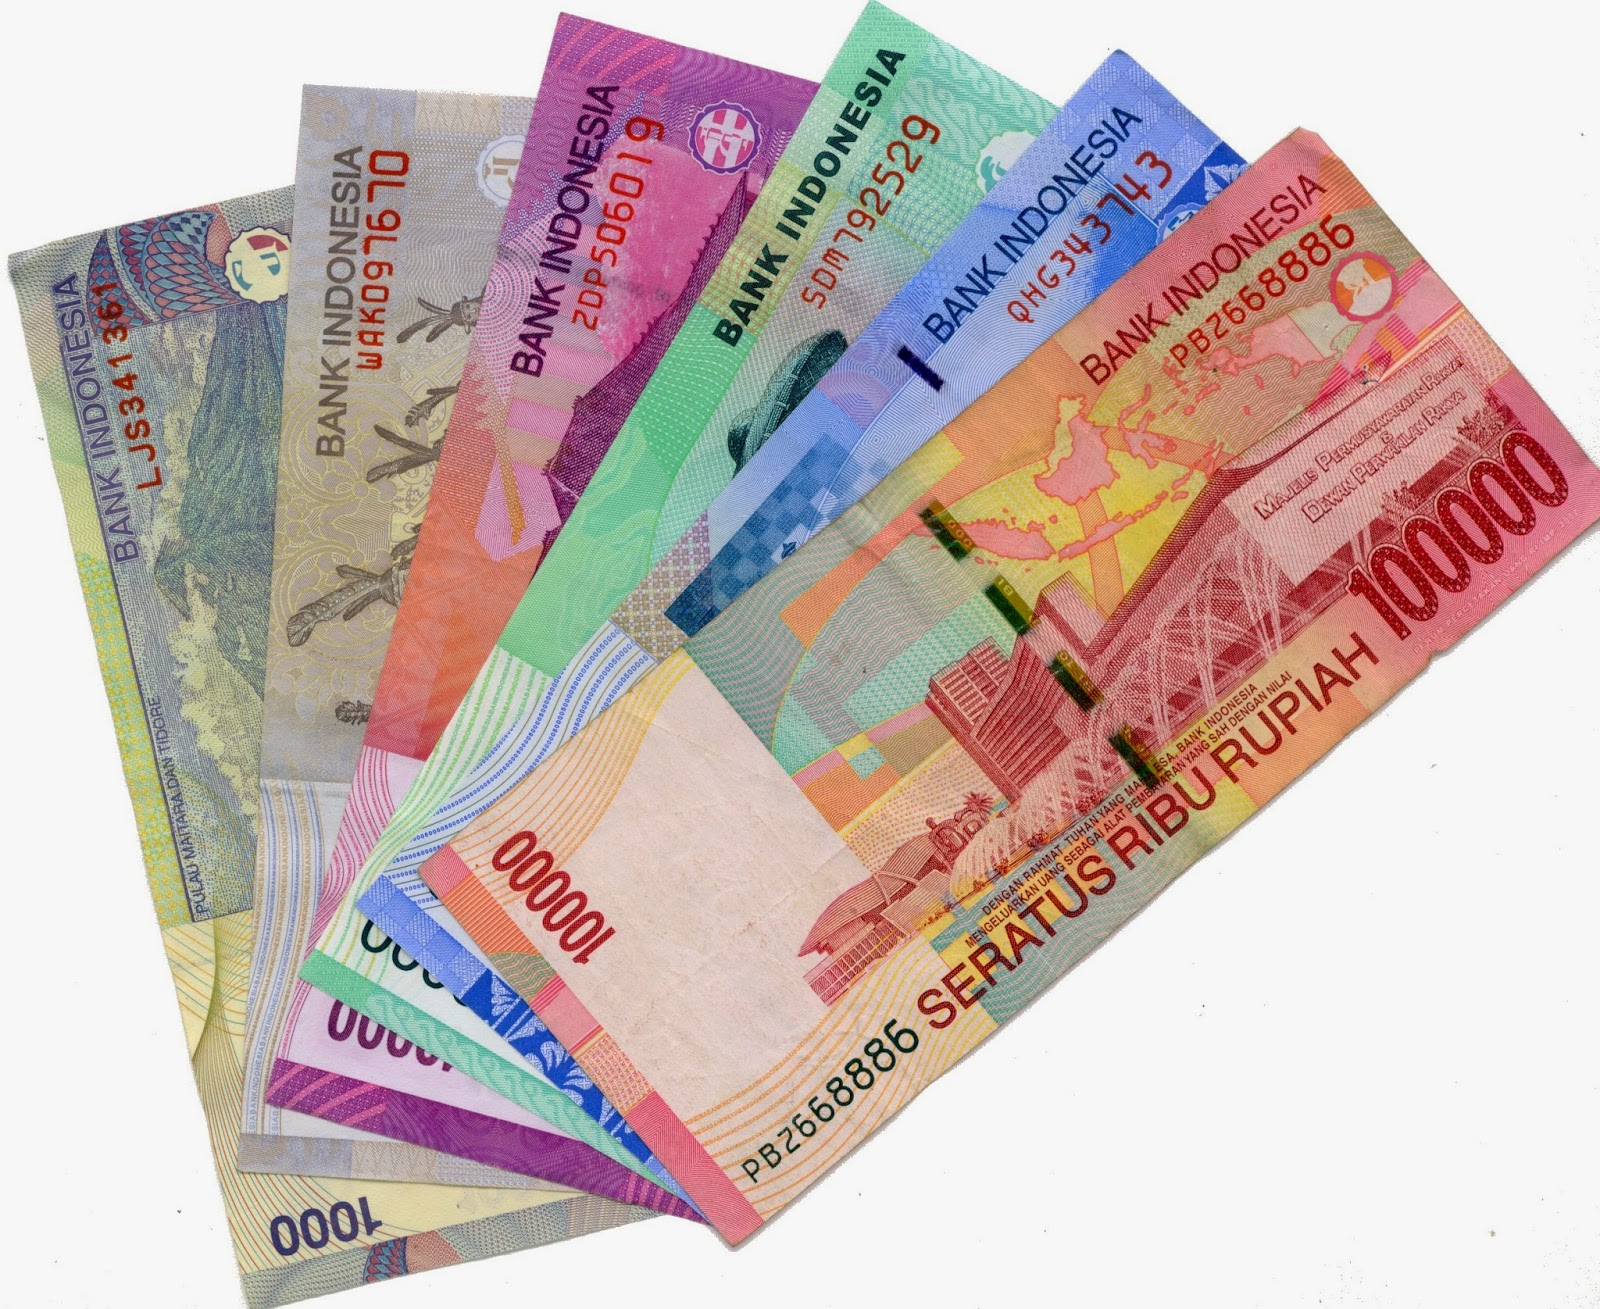 http://di-ta.com/uang-elektronik-mandiri-e-cash/